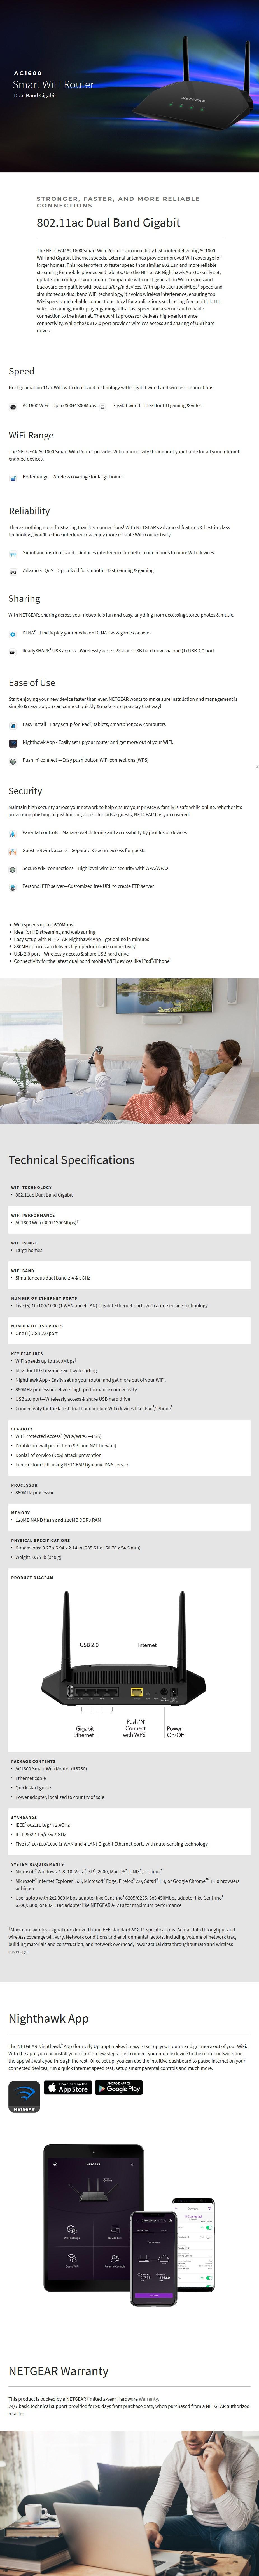 Netgear R6260 AC1600 Dual-Band Smart Wi-Fi Router - Desktop Overview 1